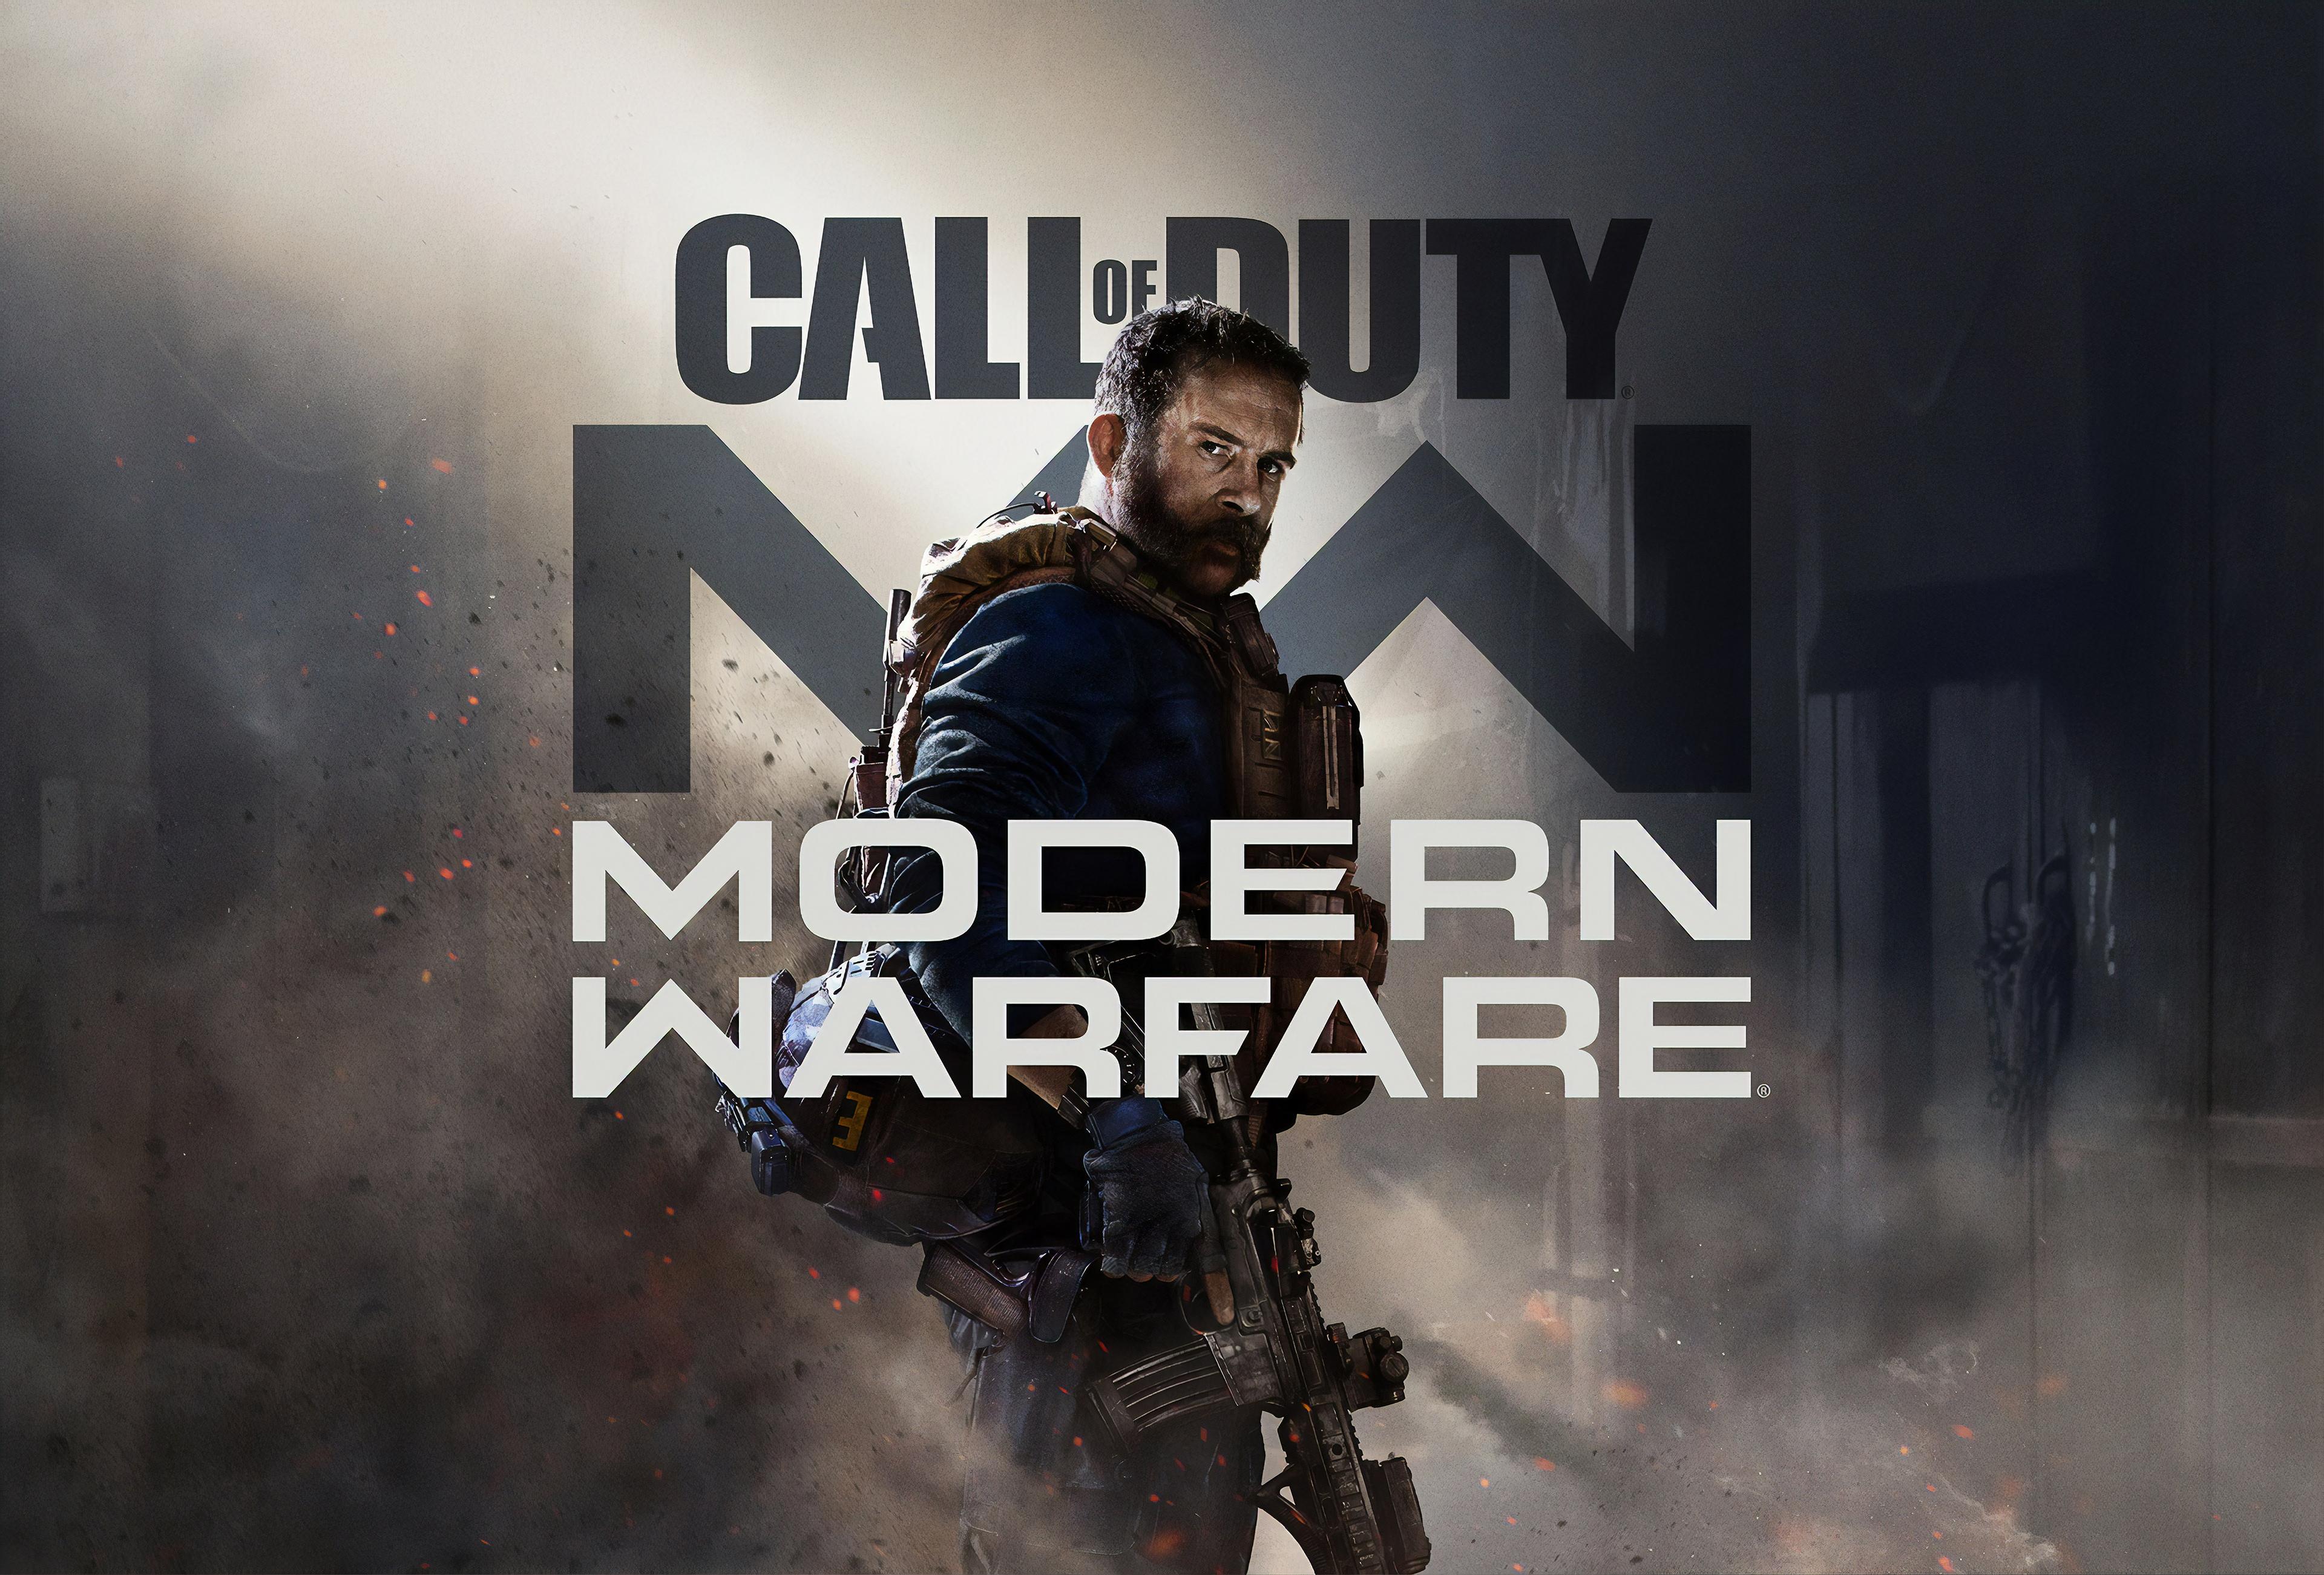 Call Of Duty Modern Warfare Remastered 2019 4k Hd Games 4k